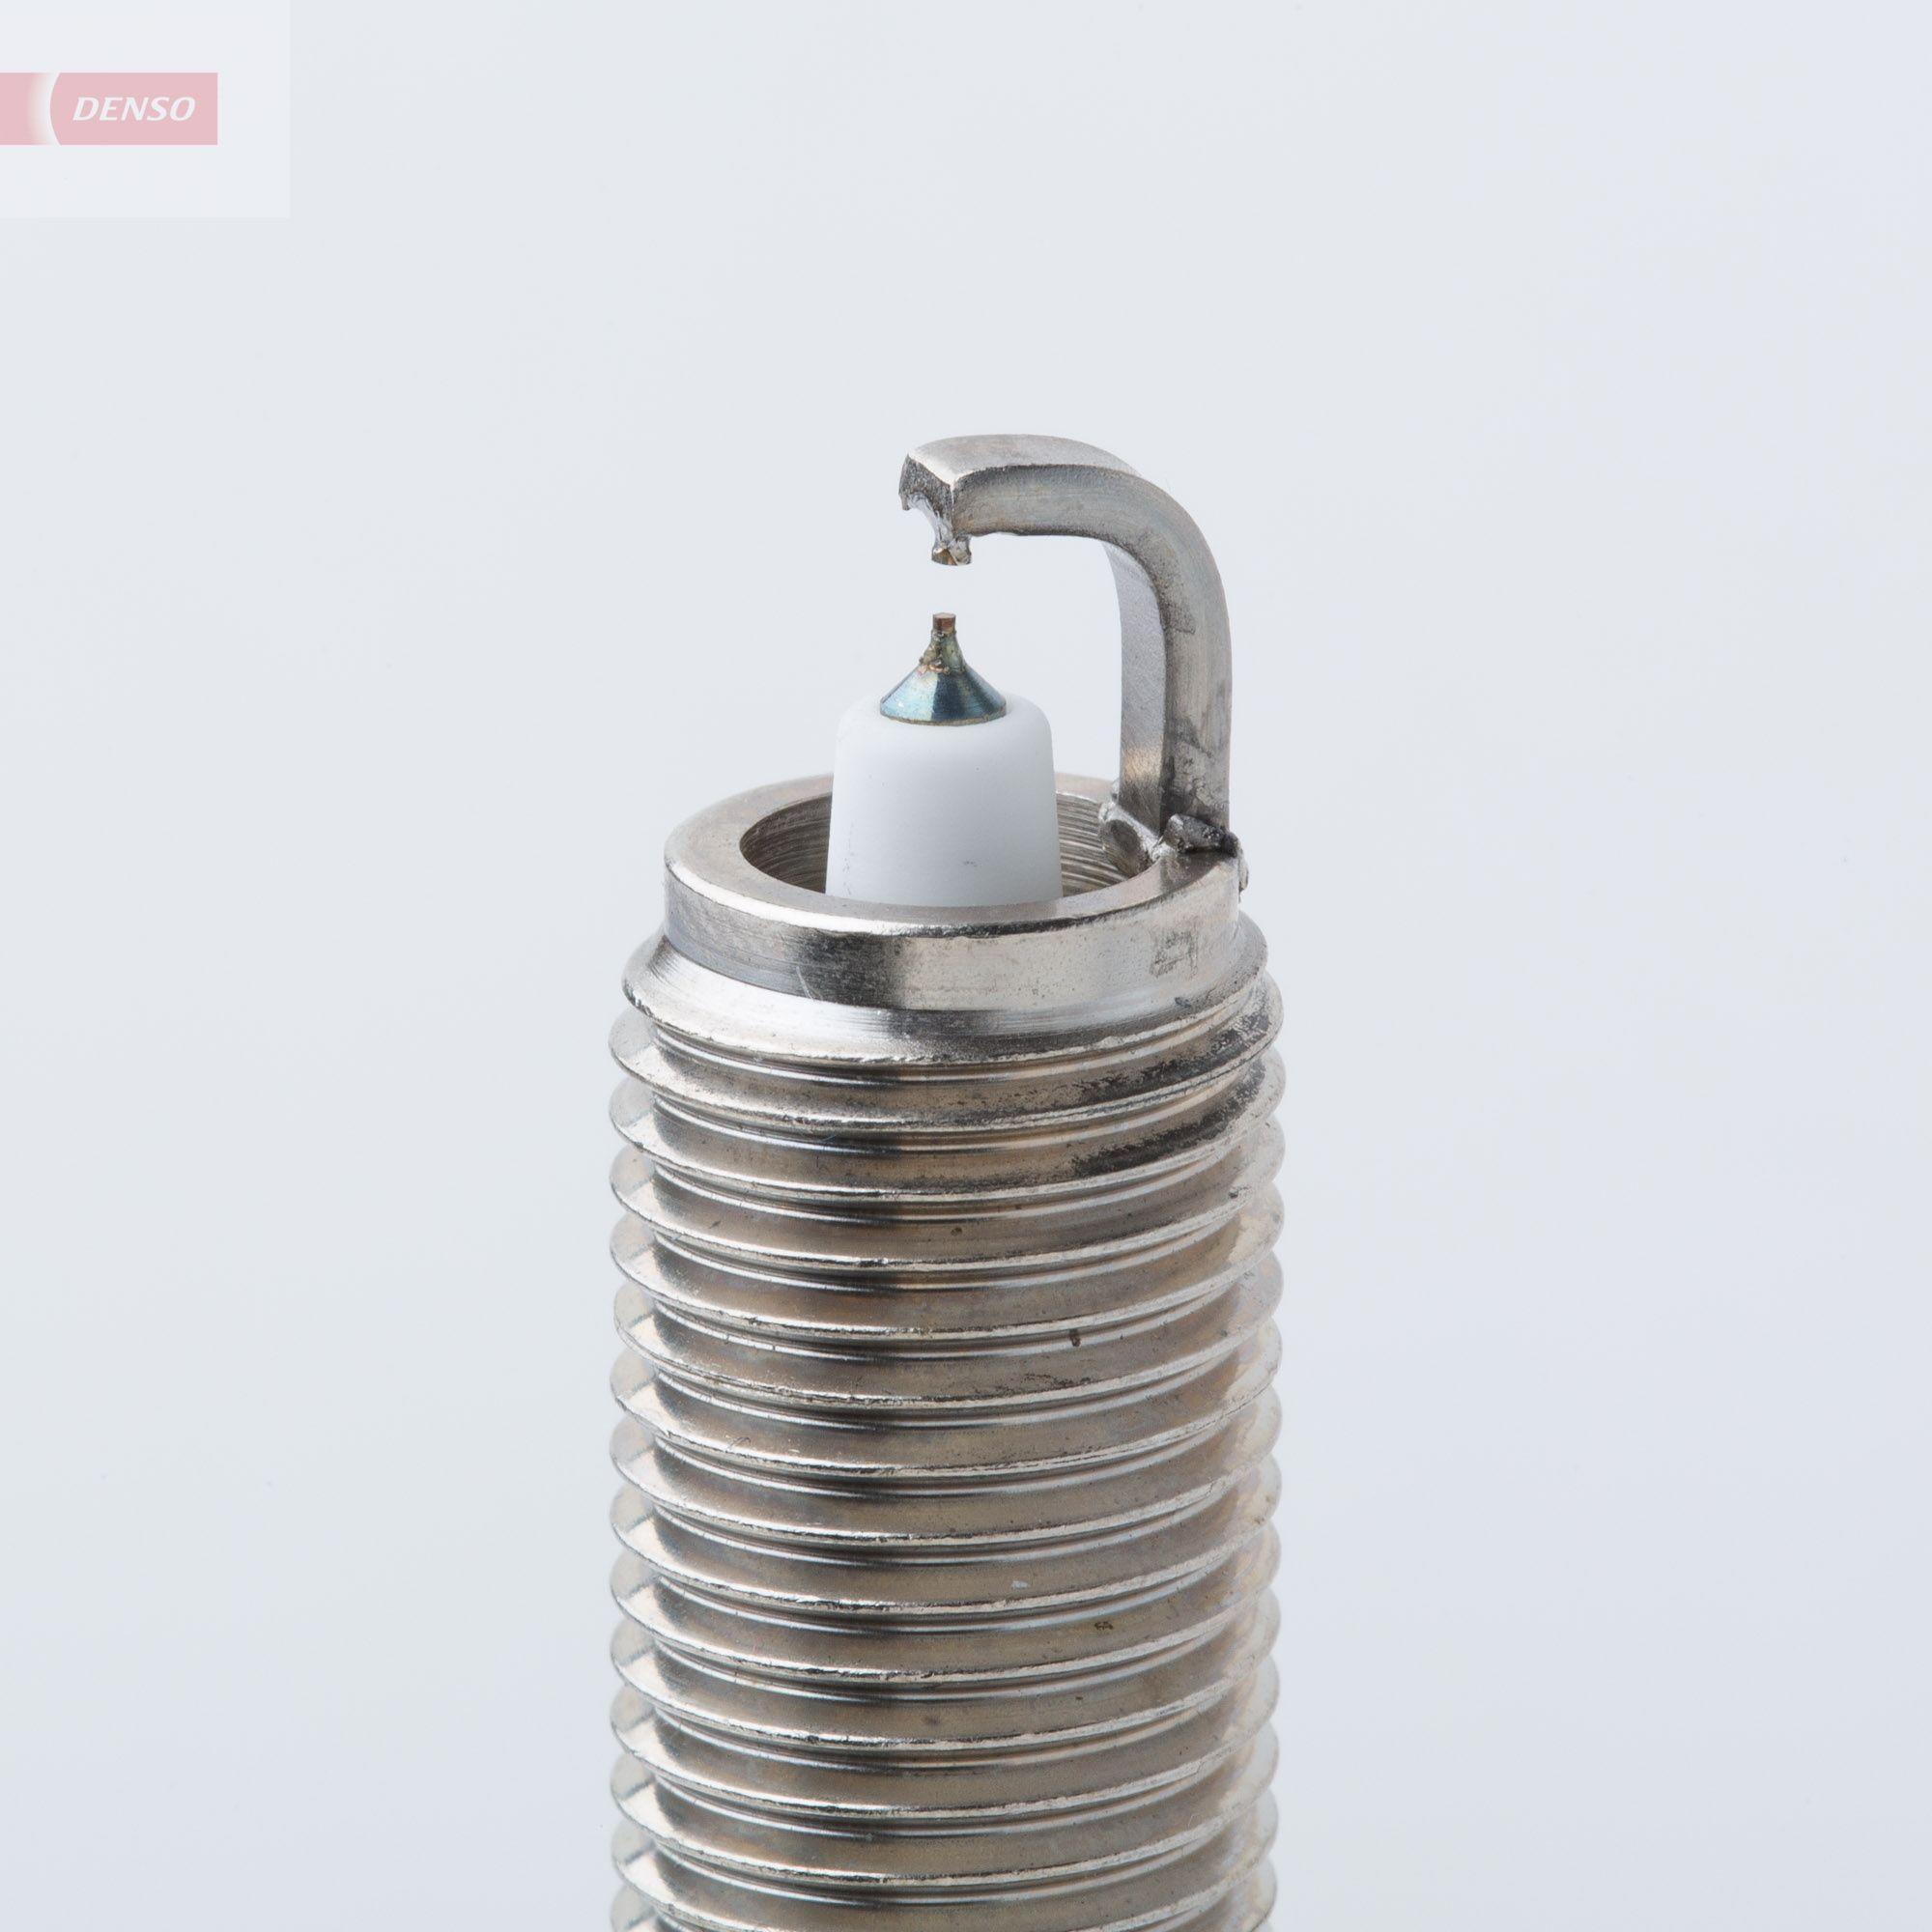 Spark Plug DENSO IXEH22TT rating